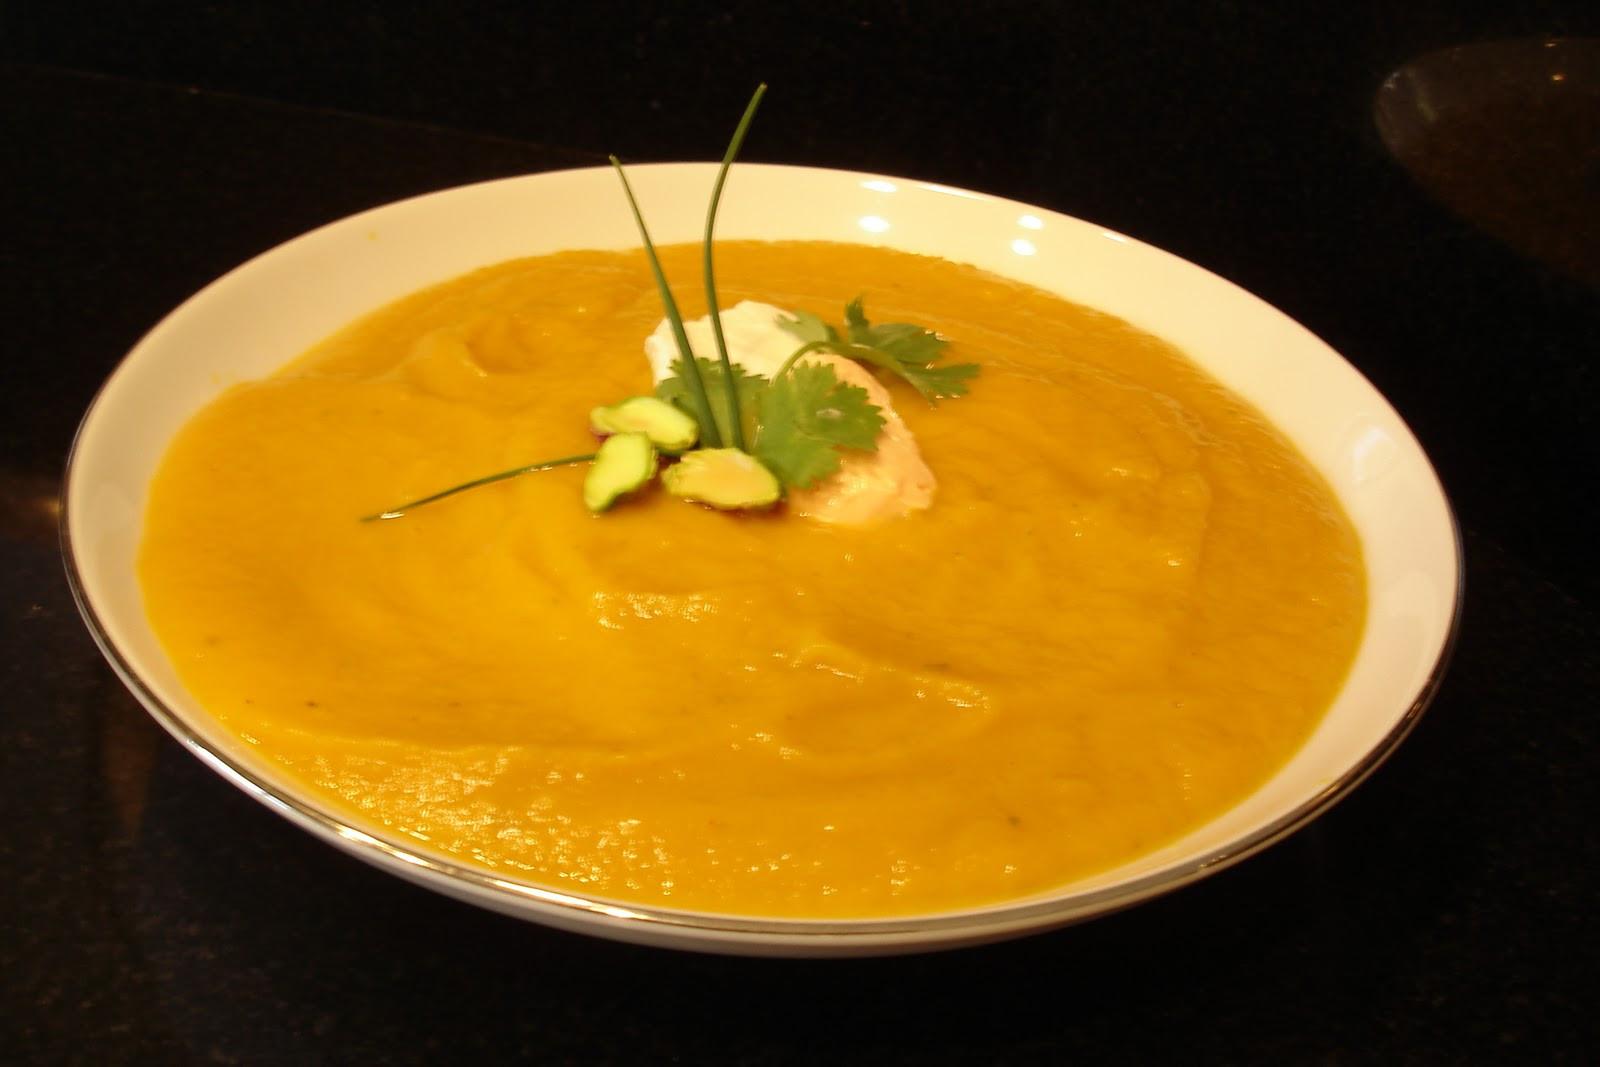 Best Butternut Squash Soup  LisaKramerArtLifestyle Recipe for the best Butternut